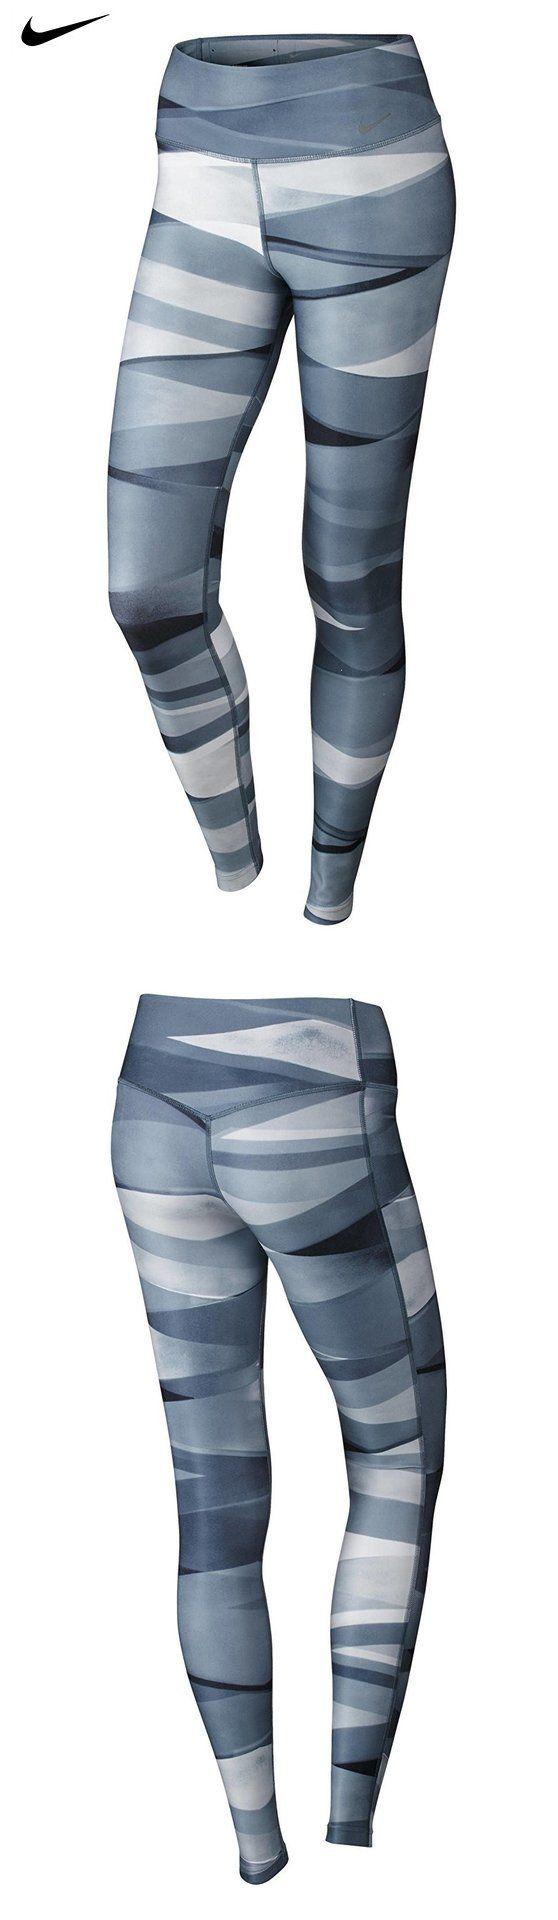 $49.99 - Nike Women's Legend 2.0 Ribbon Wrap Training Tight (XL)